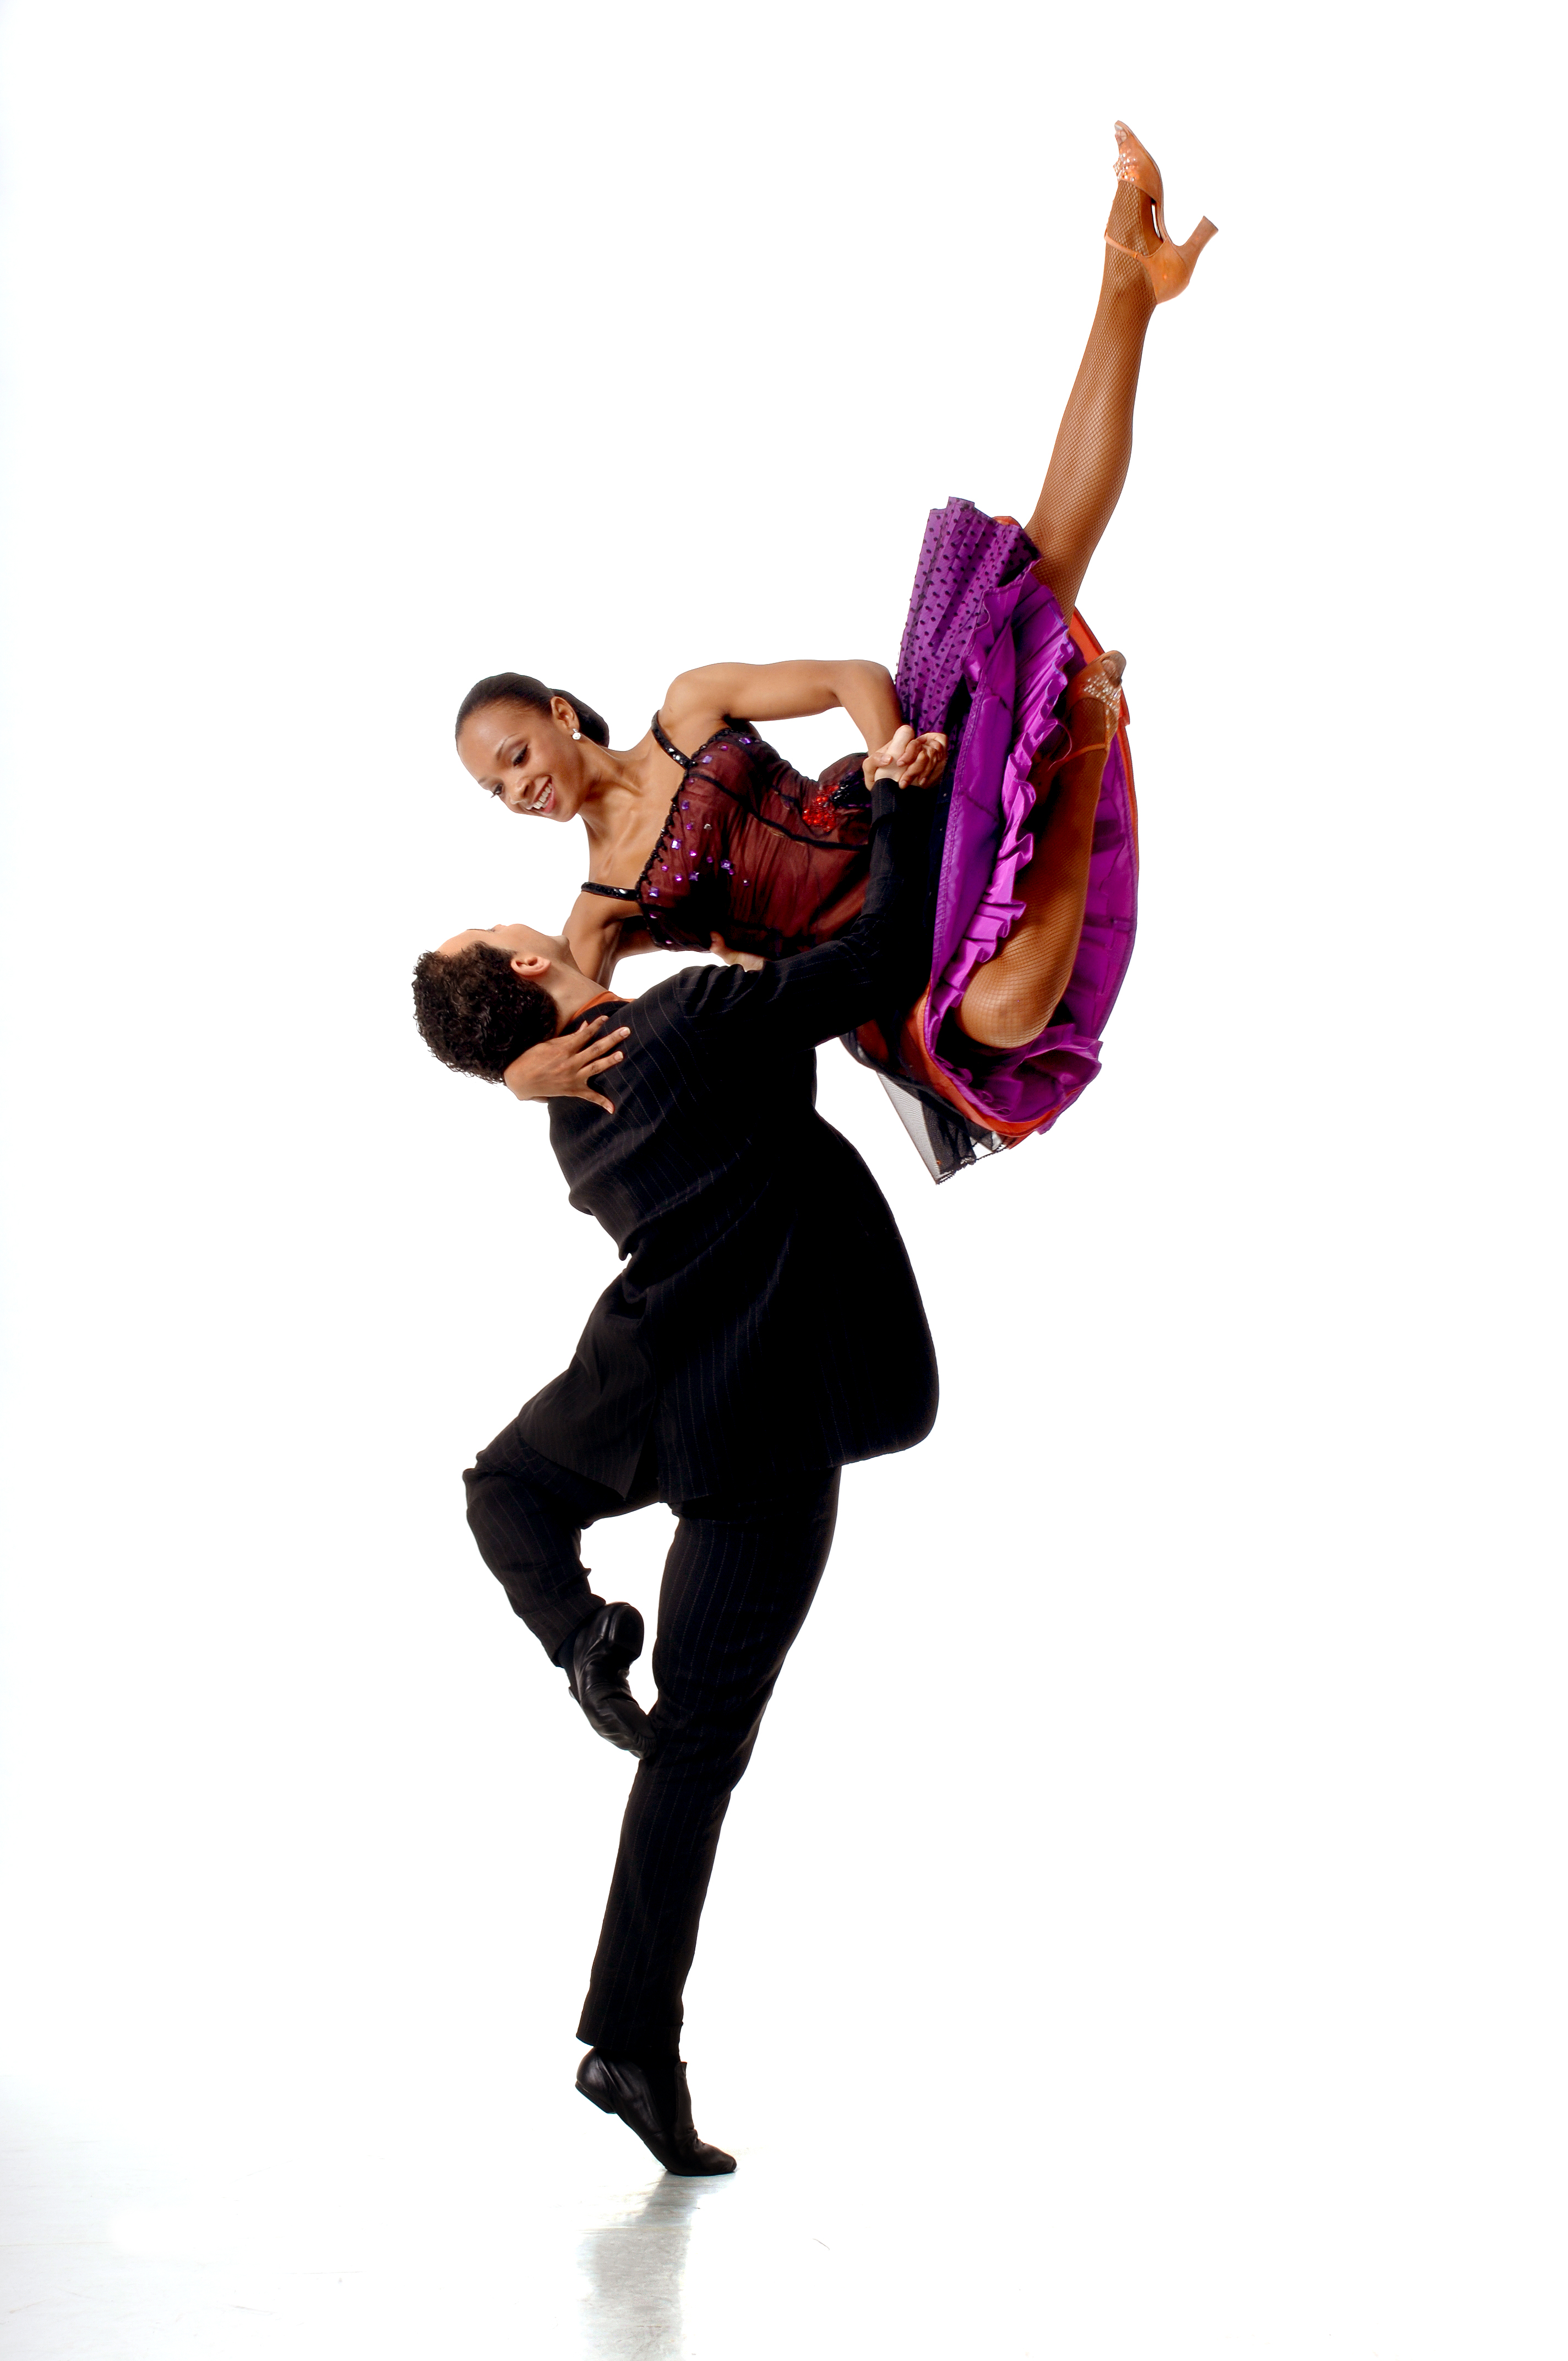 Hispanic dancing teens high resolution stock photography and images